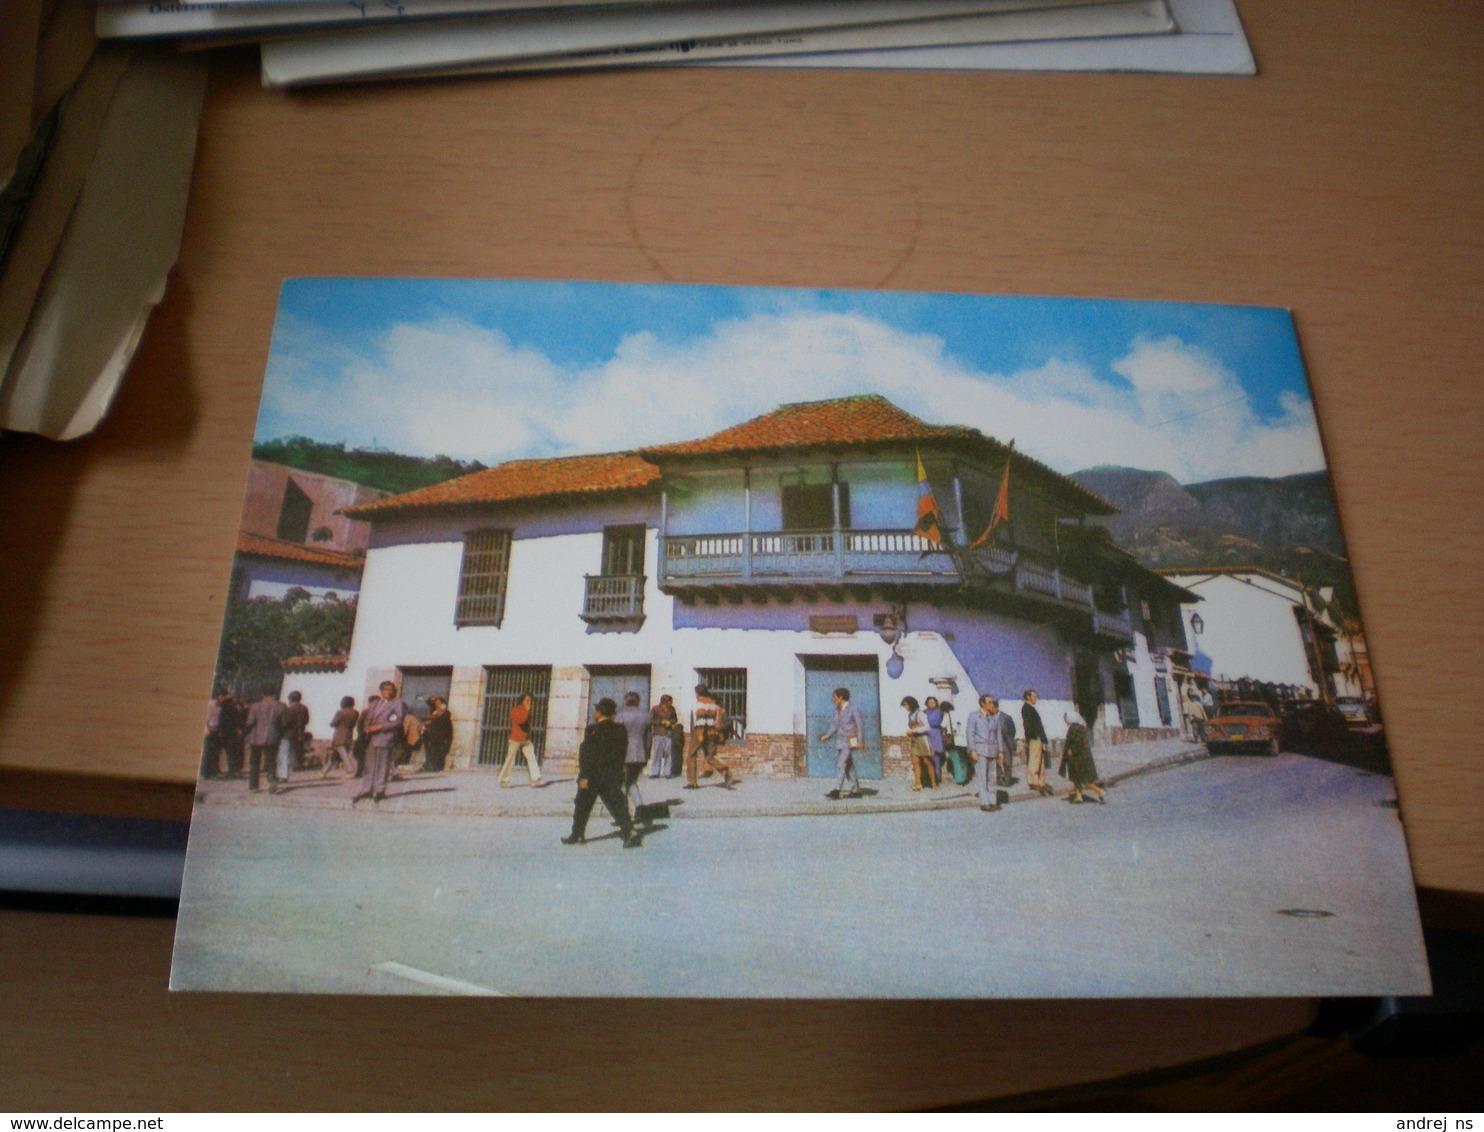 Bogata Casa Museo 20 De Juli De 1810 Fashada - Colombie